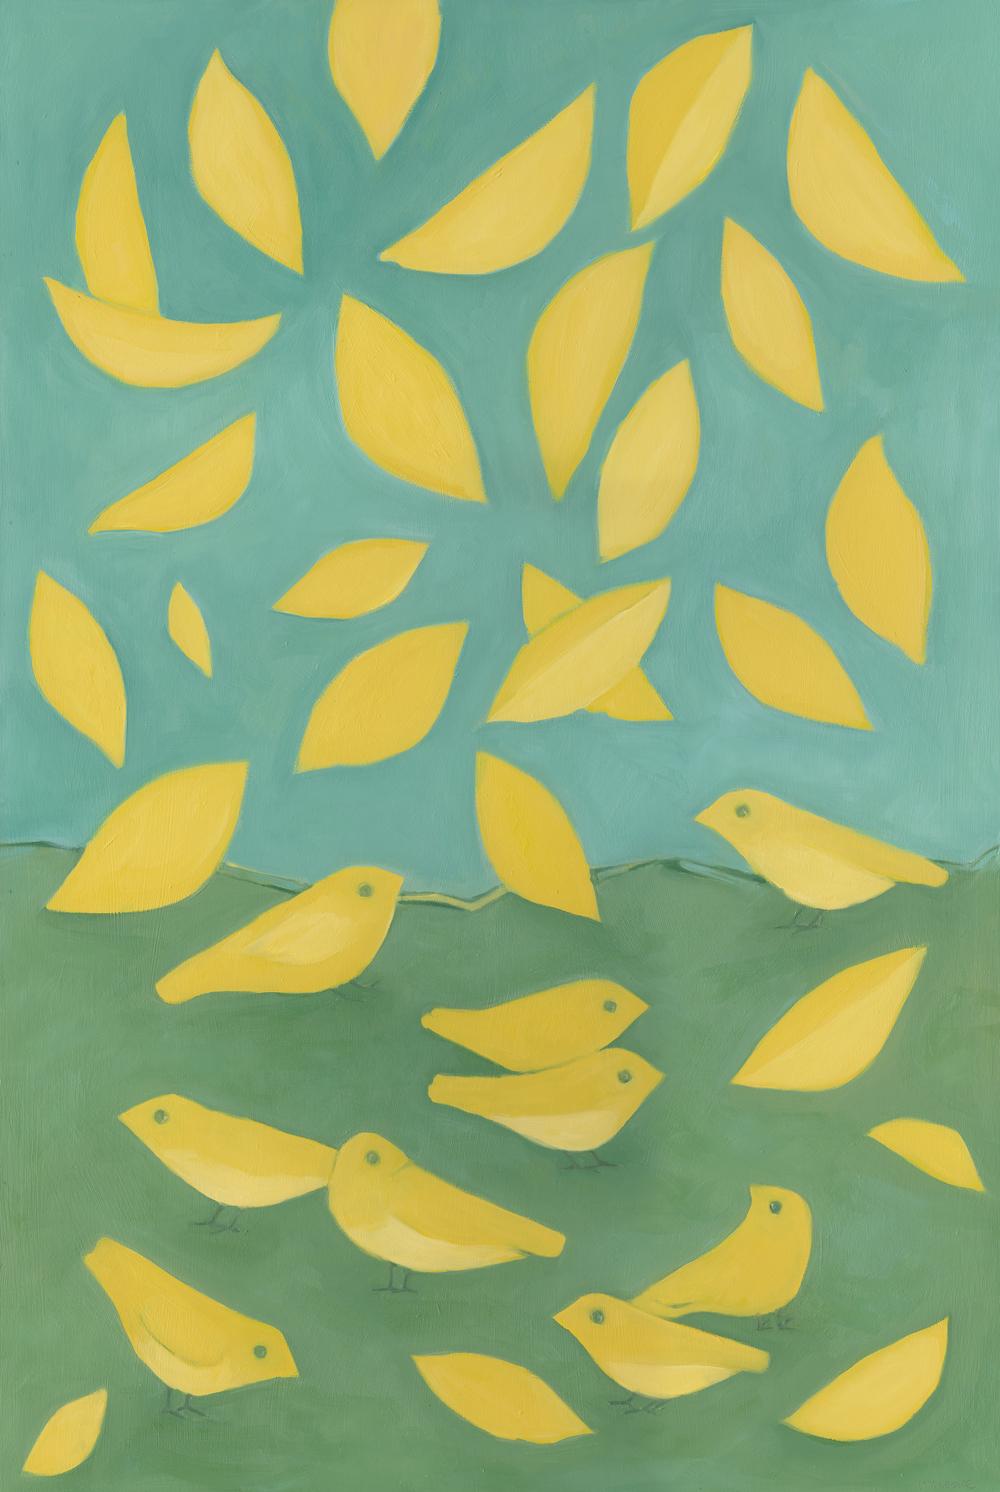 Yellow Birds & Leaves